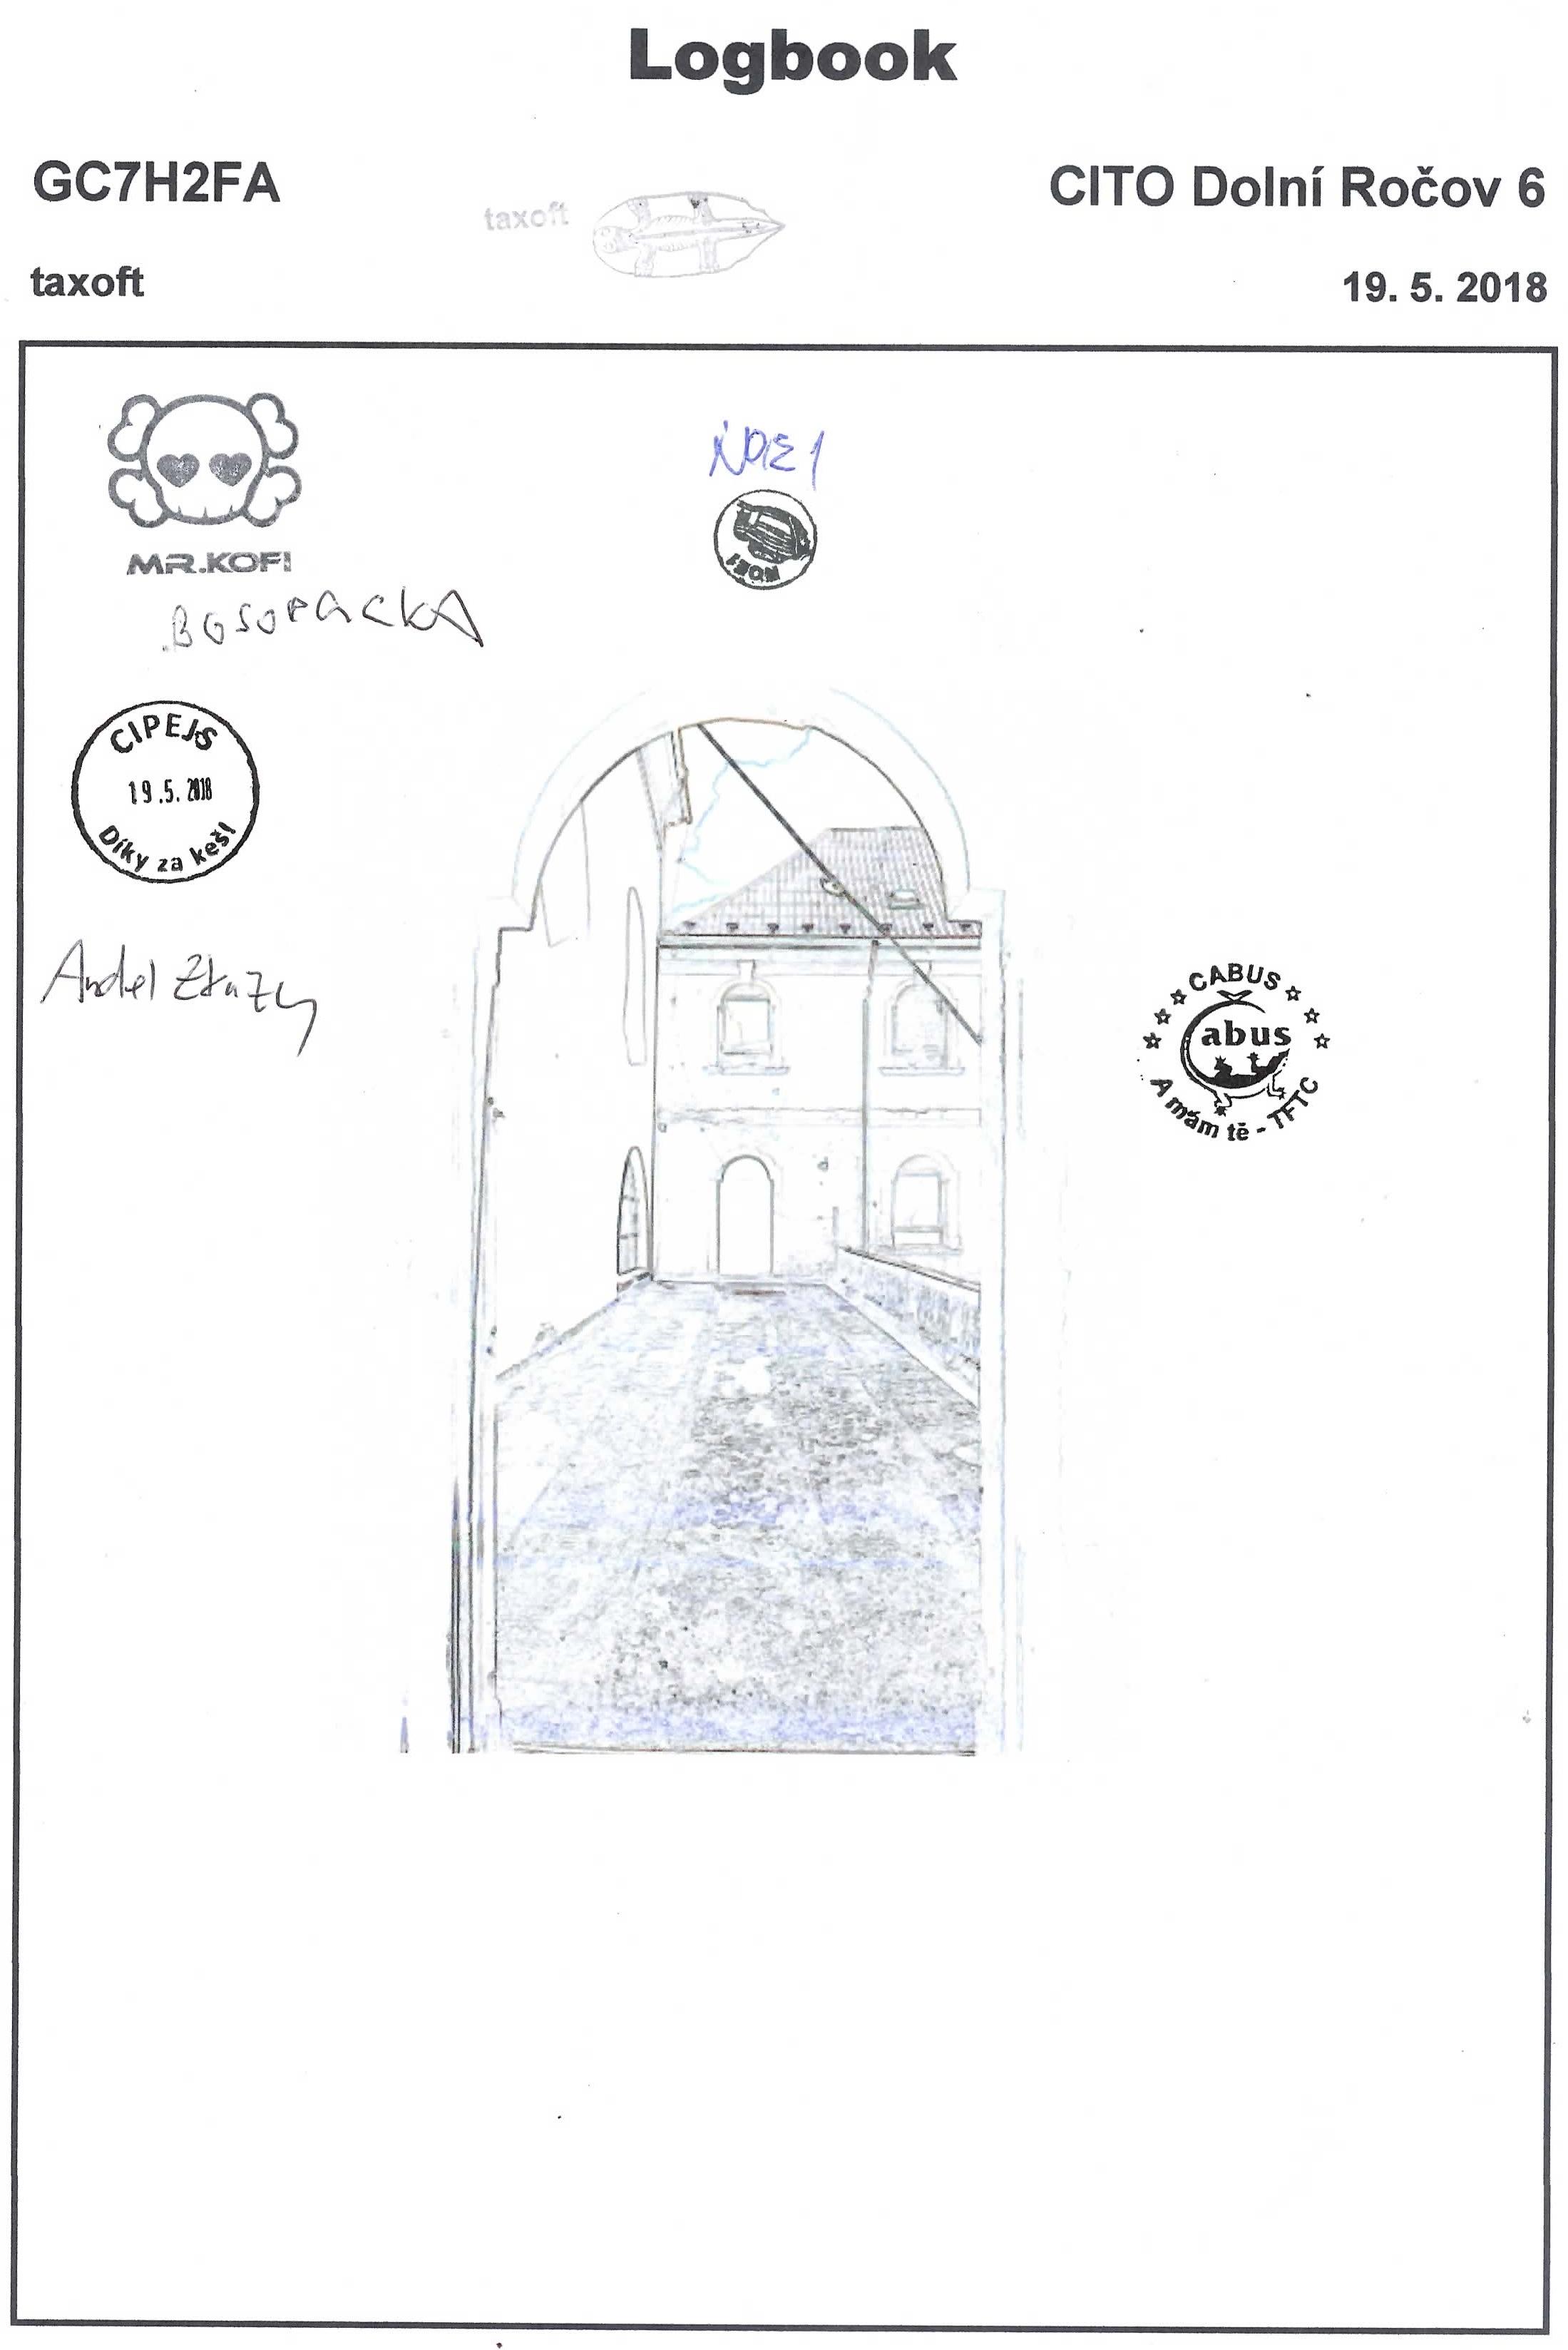 GC7H2FA - CITO Dolní Ročov 6 - logbook